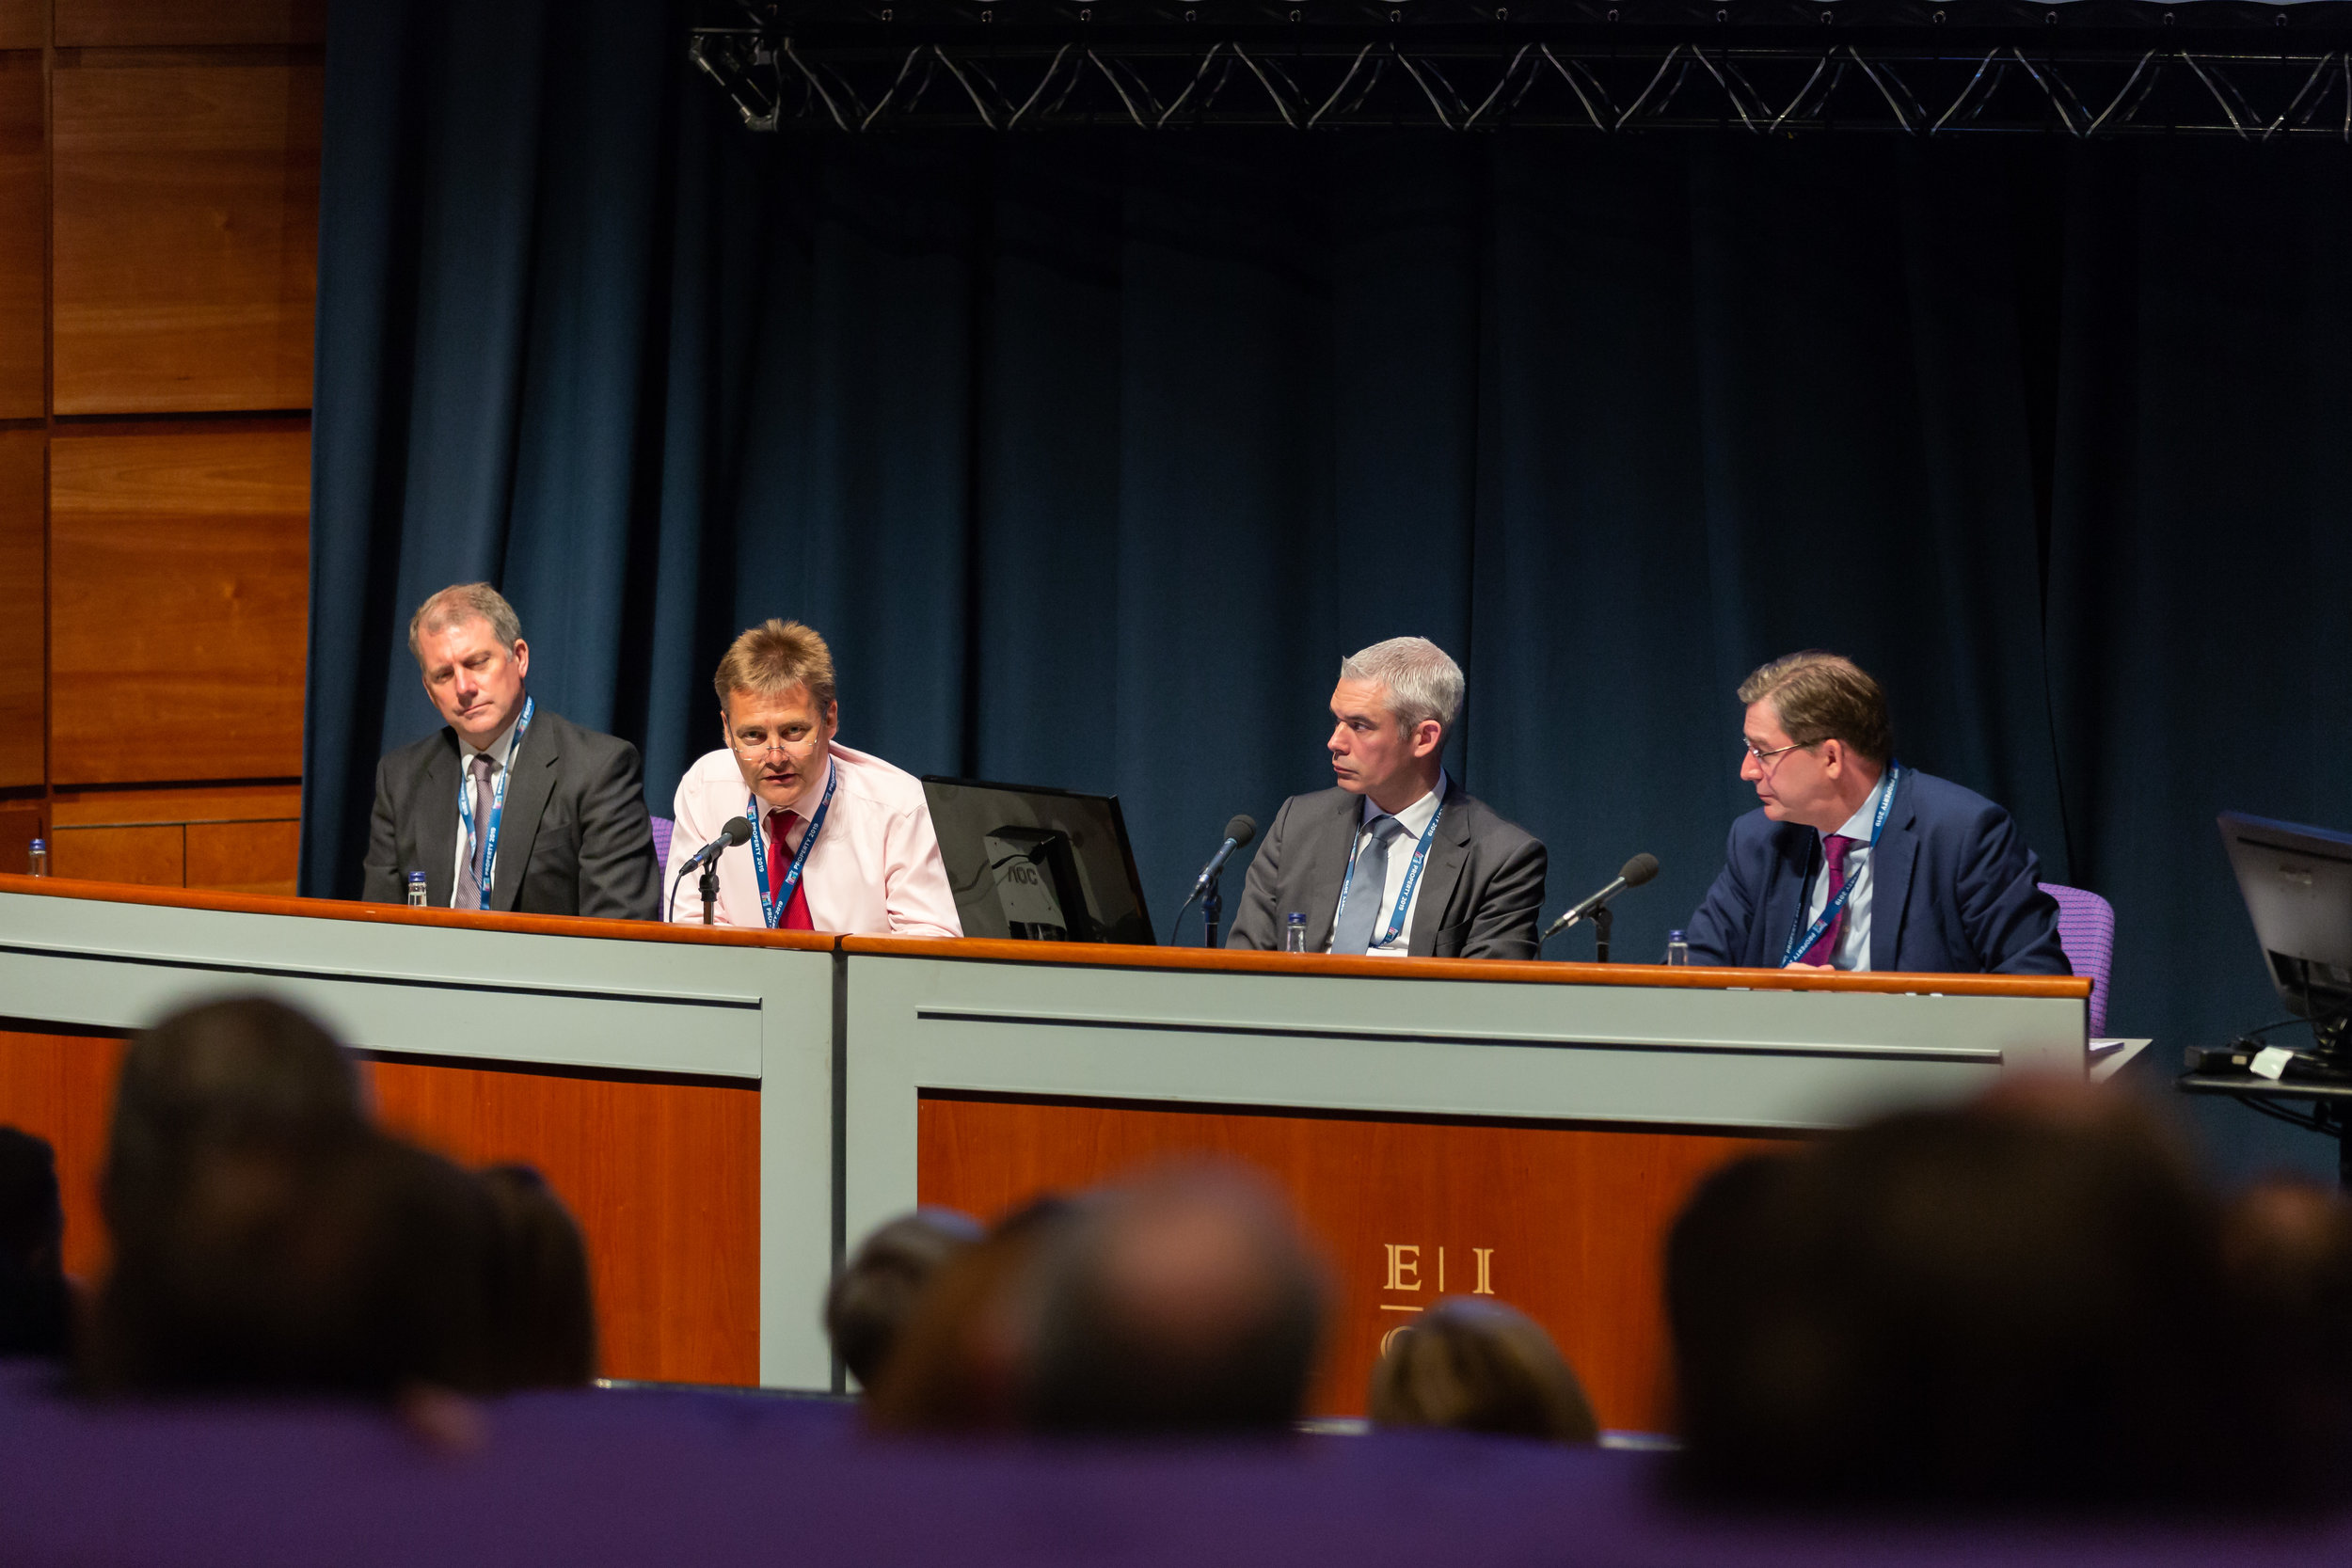 ShepherdandWedderburnPropertyConference2019-114.jpg